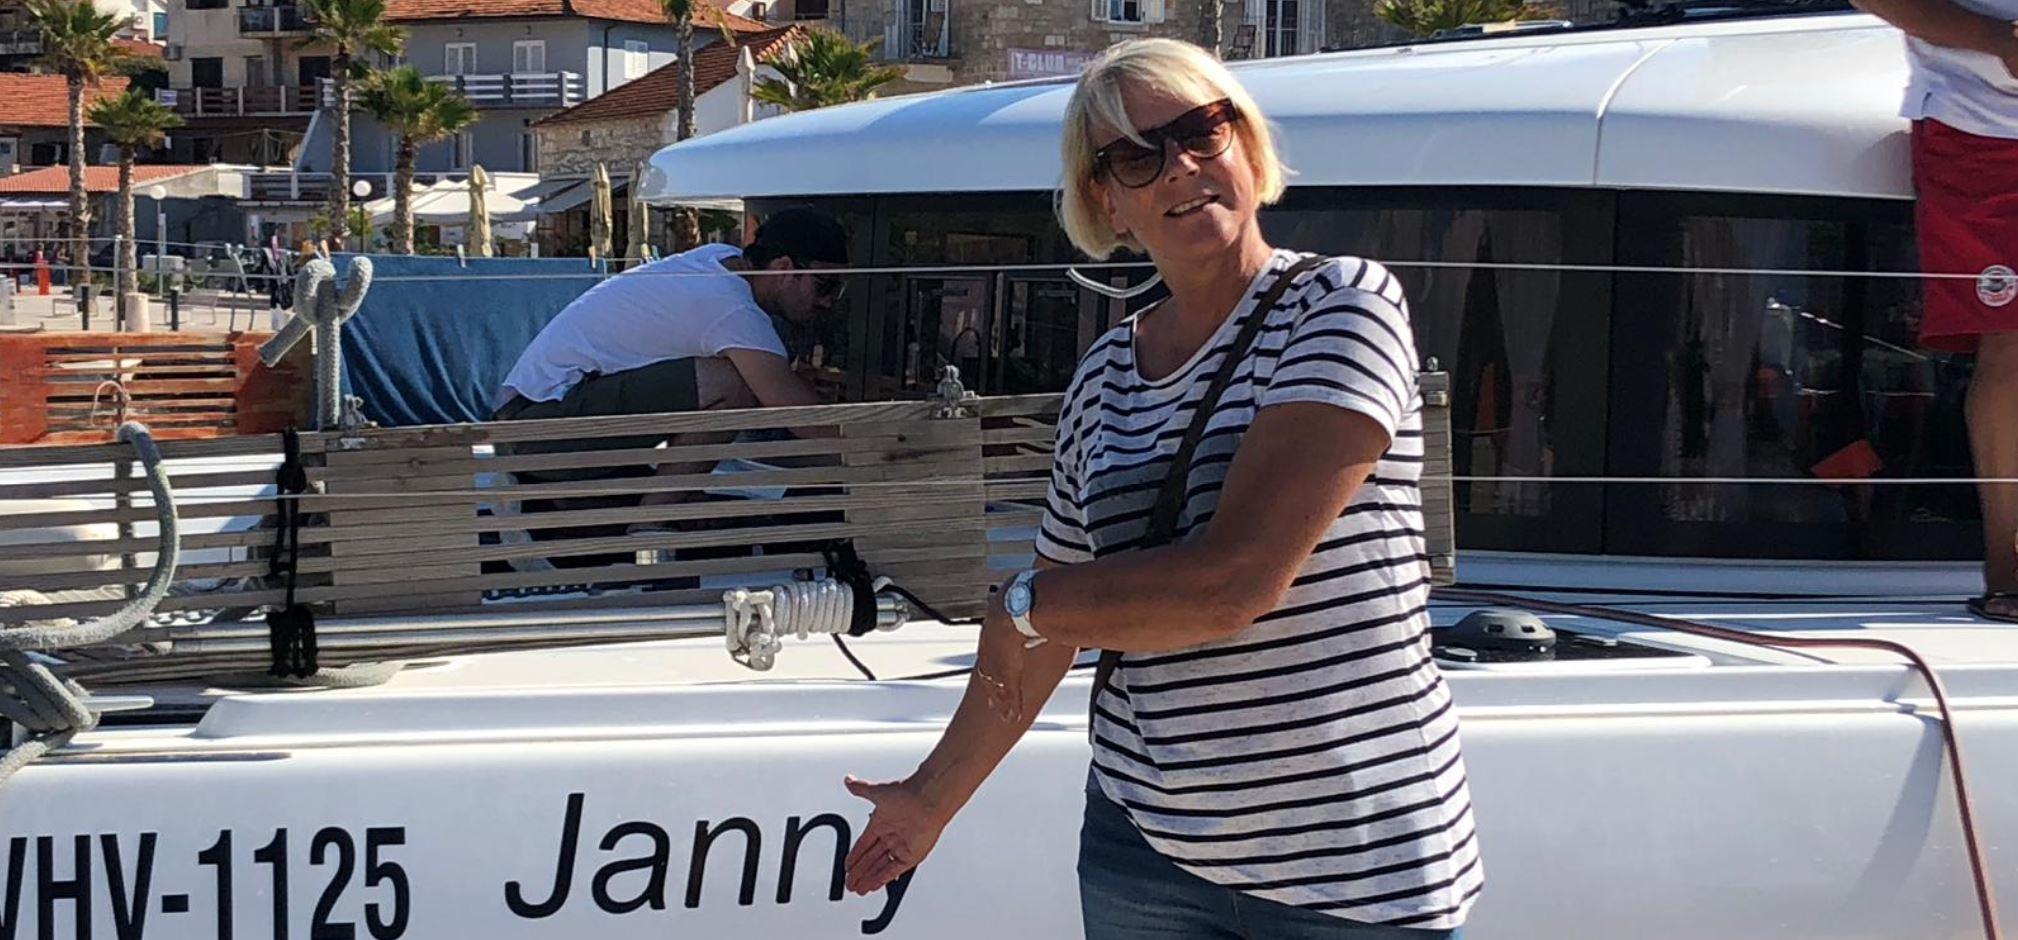 Meine Frau Janny ist stolz auf Katamaran Lagoon 42 Janny